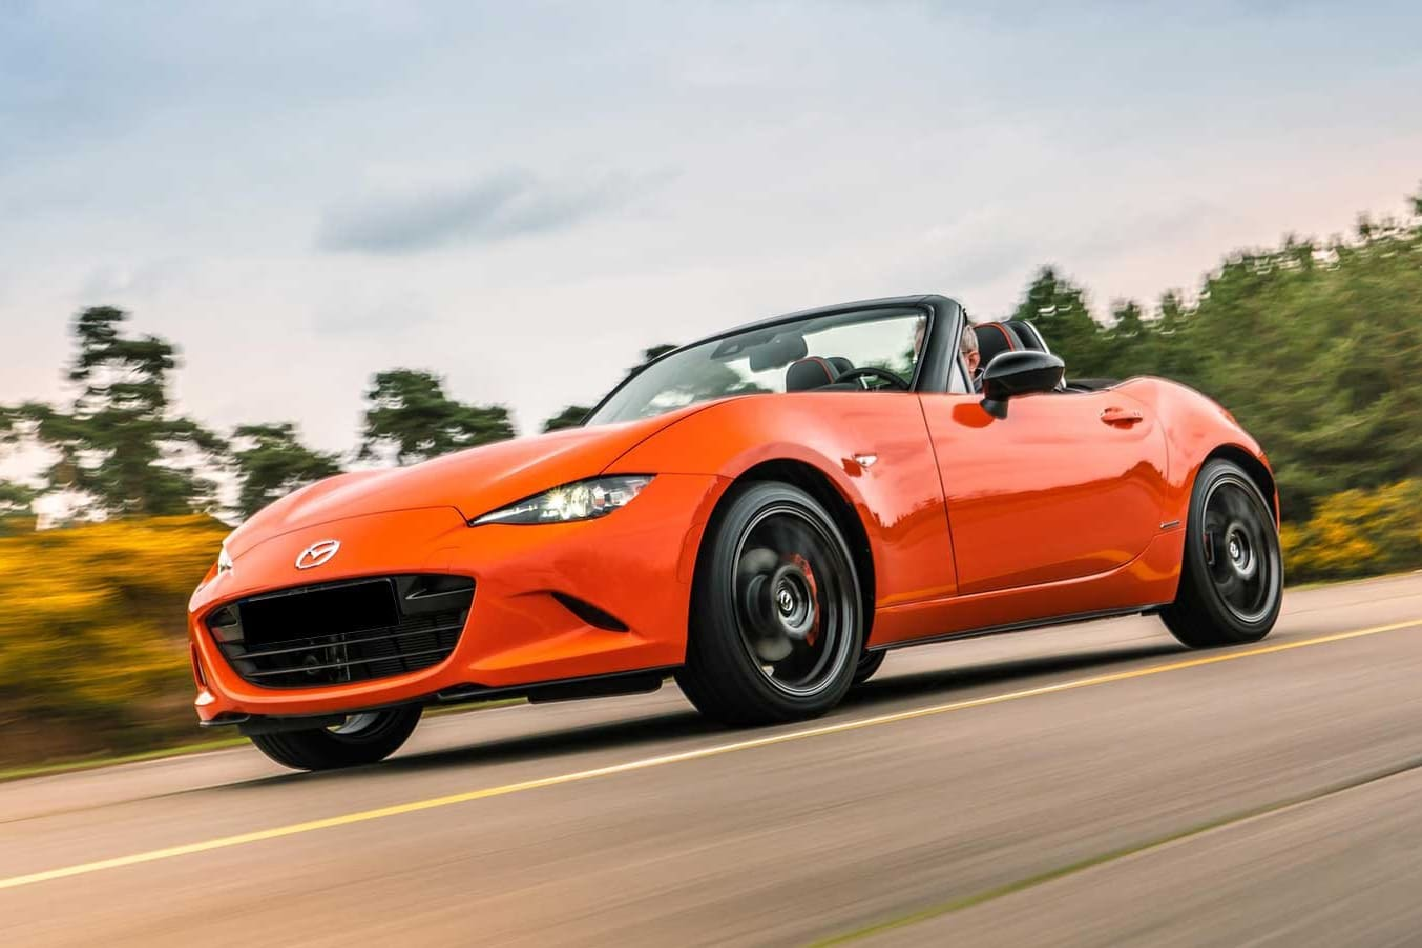 2019 Mazda MX-5 30th Anniversary Edition review